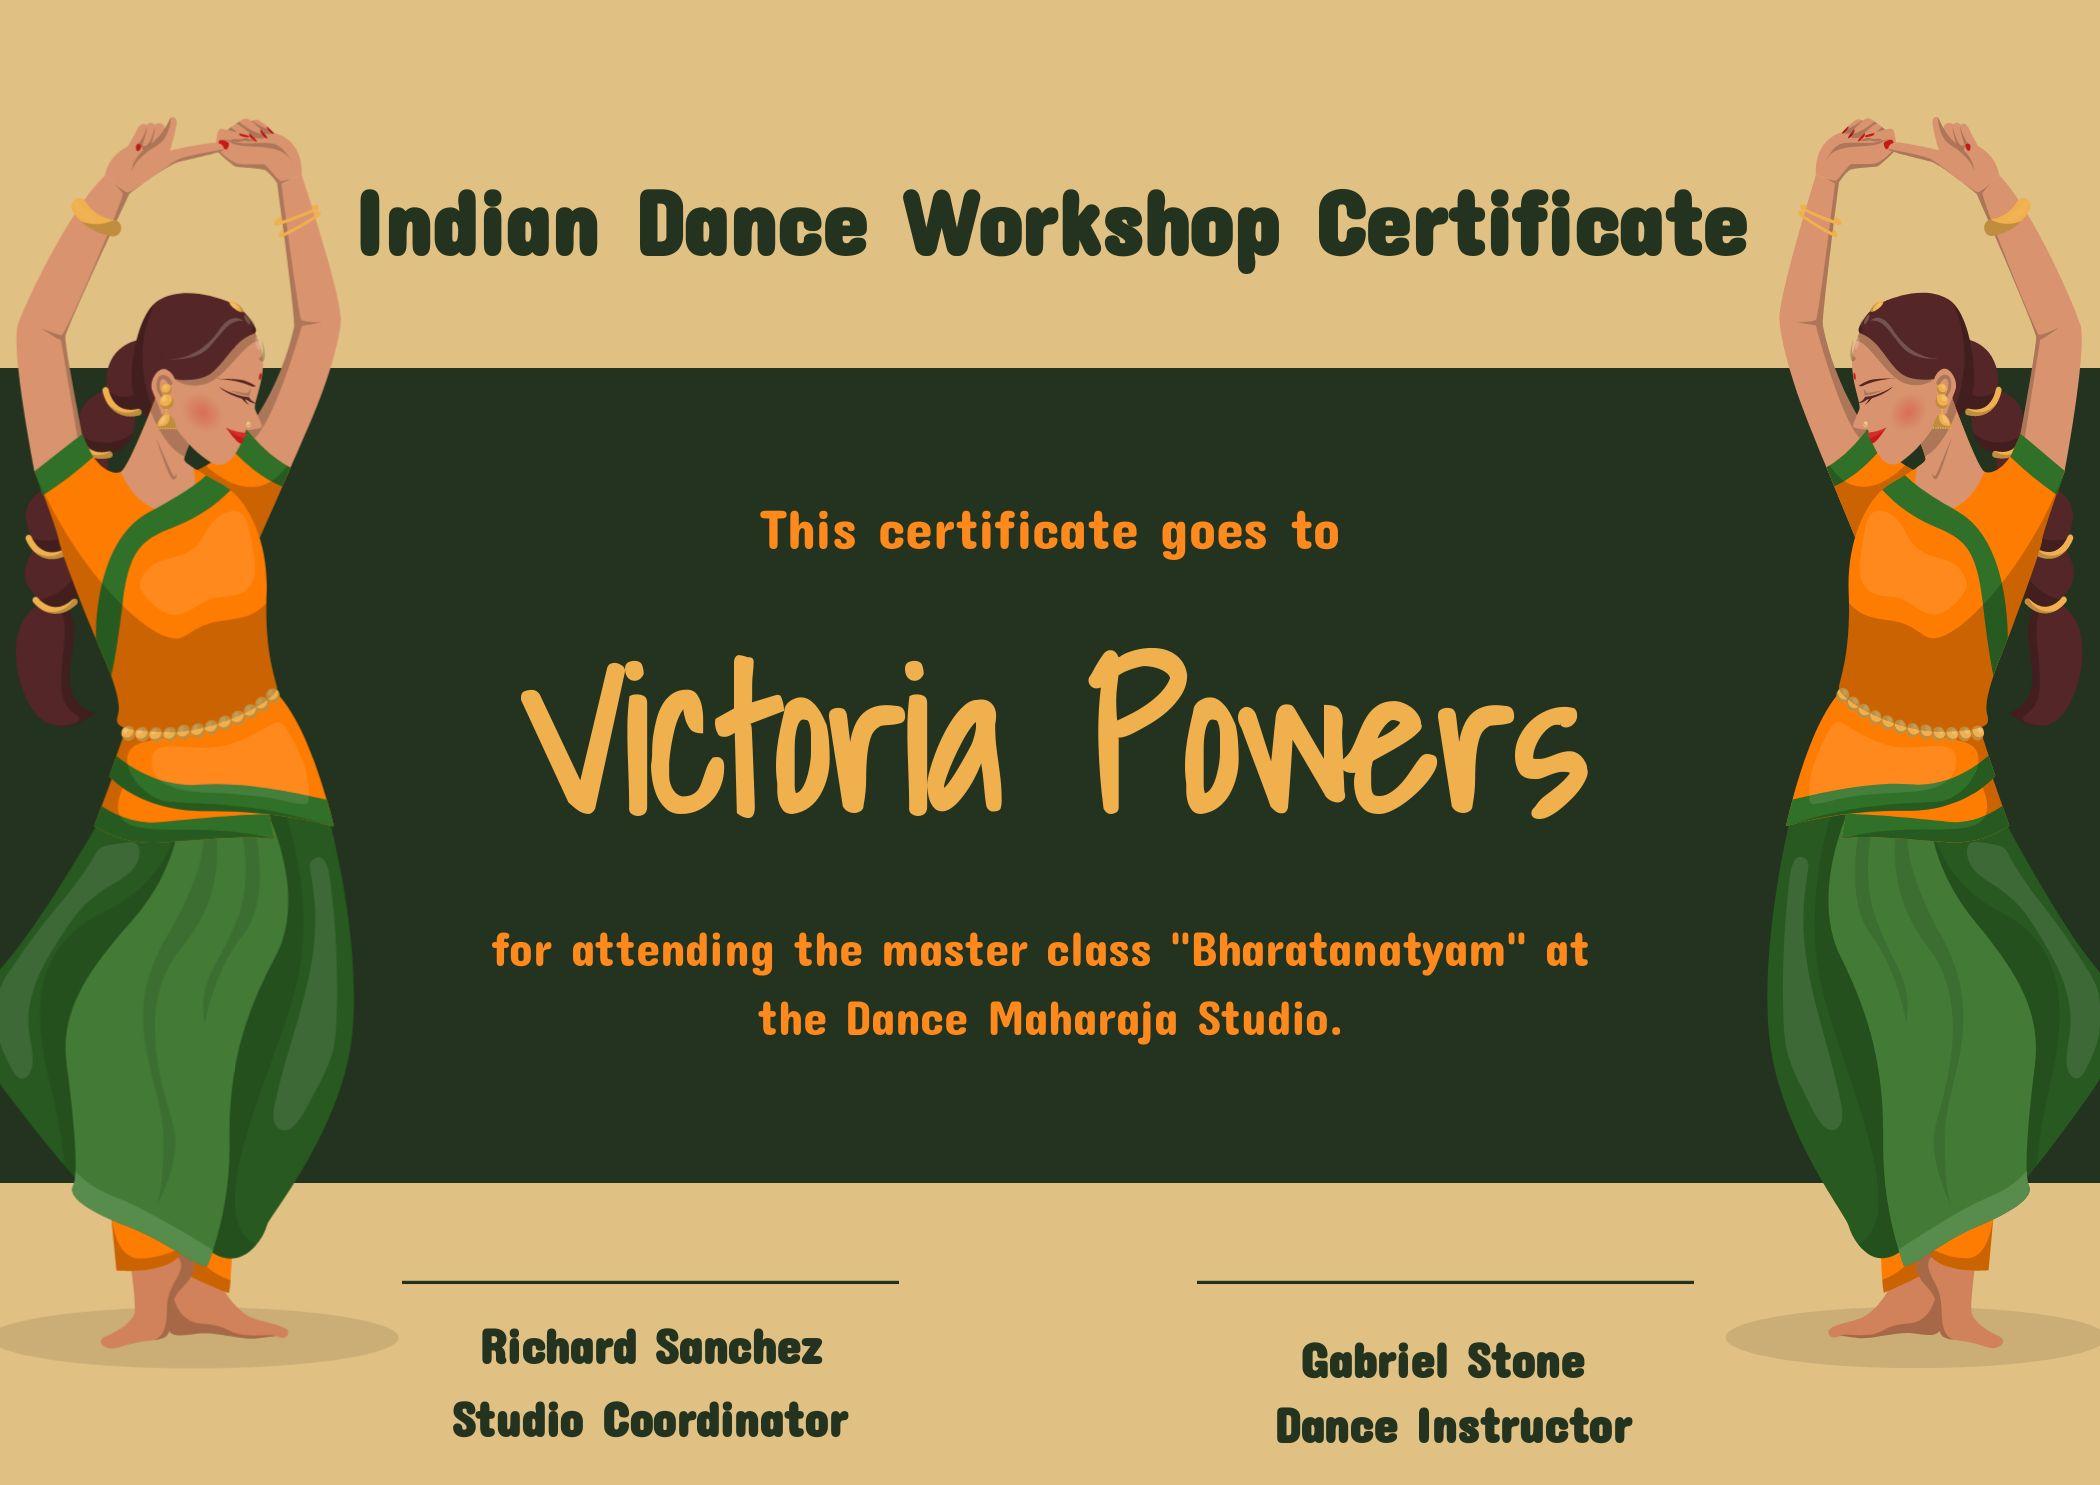 Indian Dance Workshop Certificate